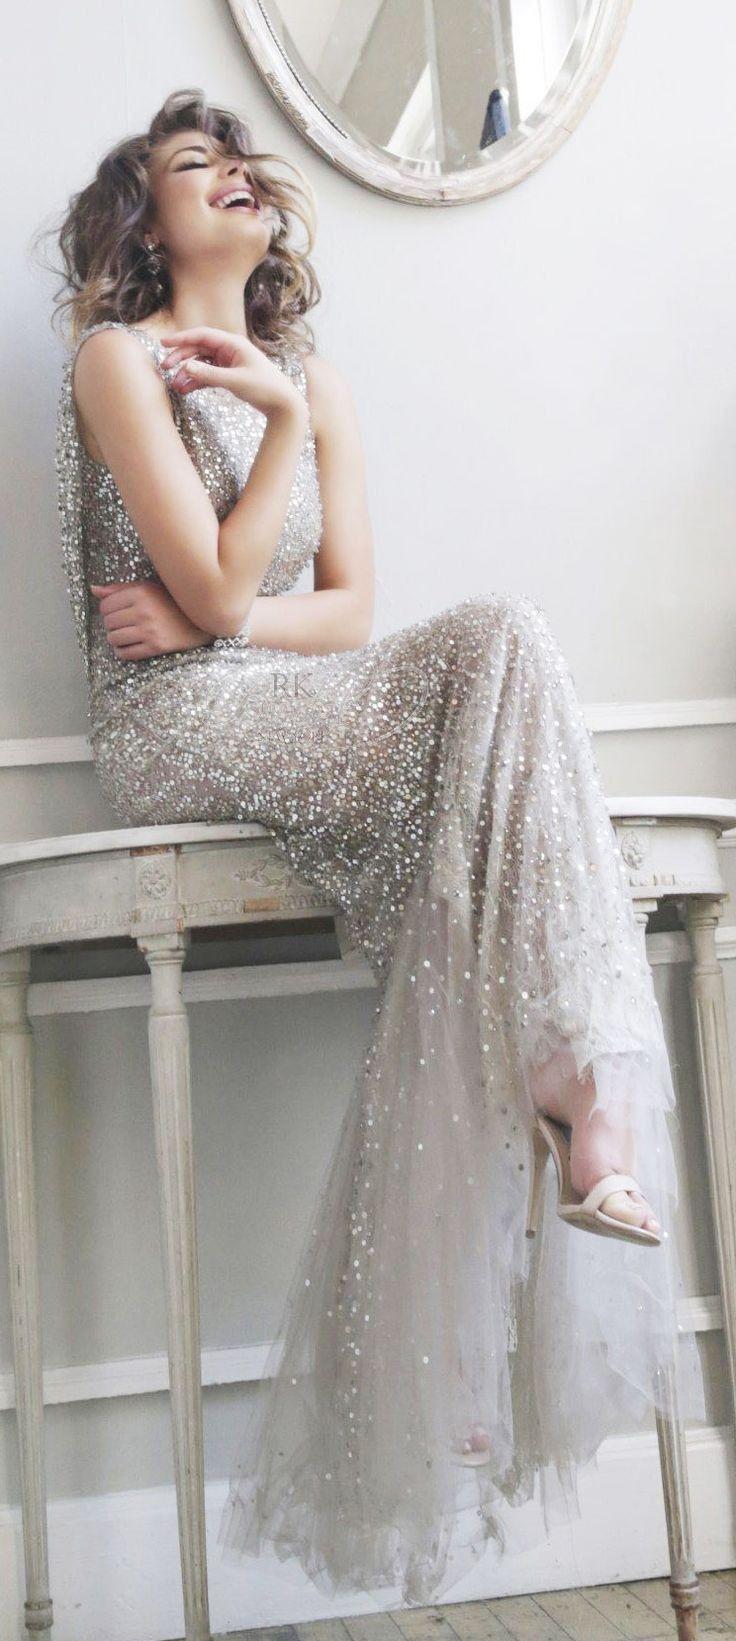 shining silver wedding dress | image via: mod wedding